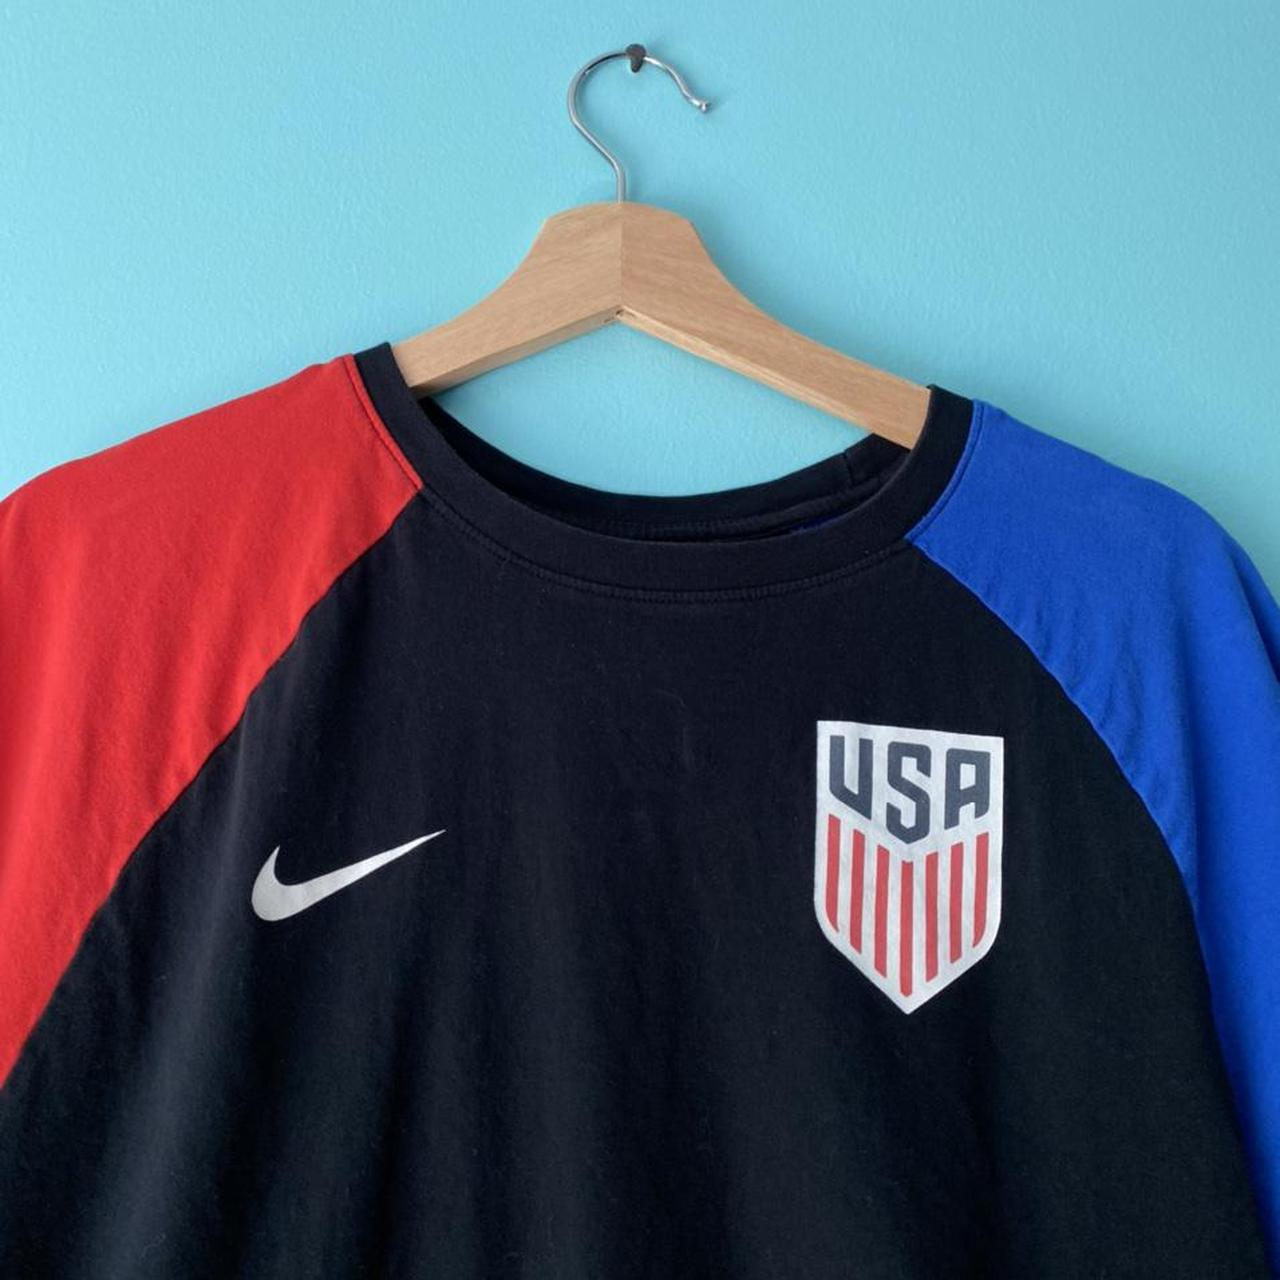 Product Image 1 - Nike Team USA soccer Olympics